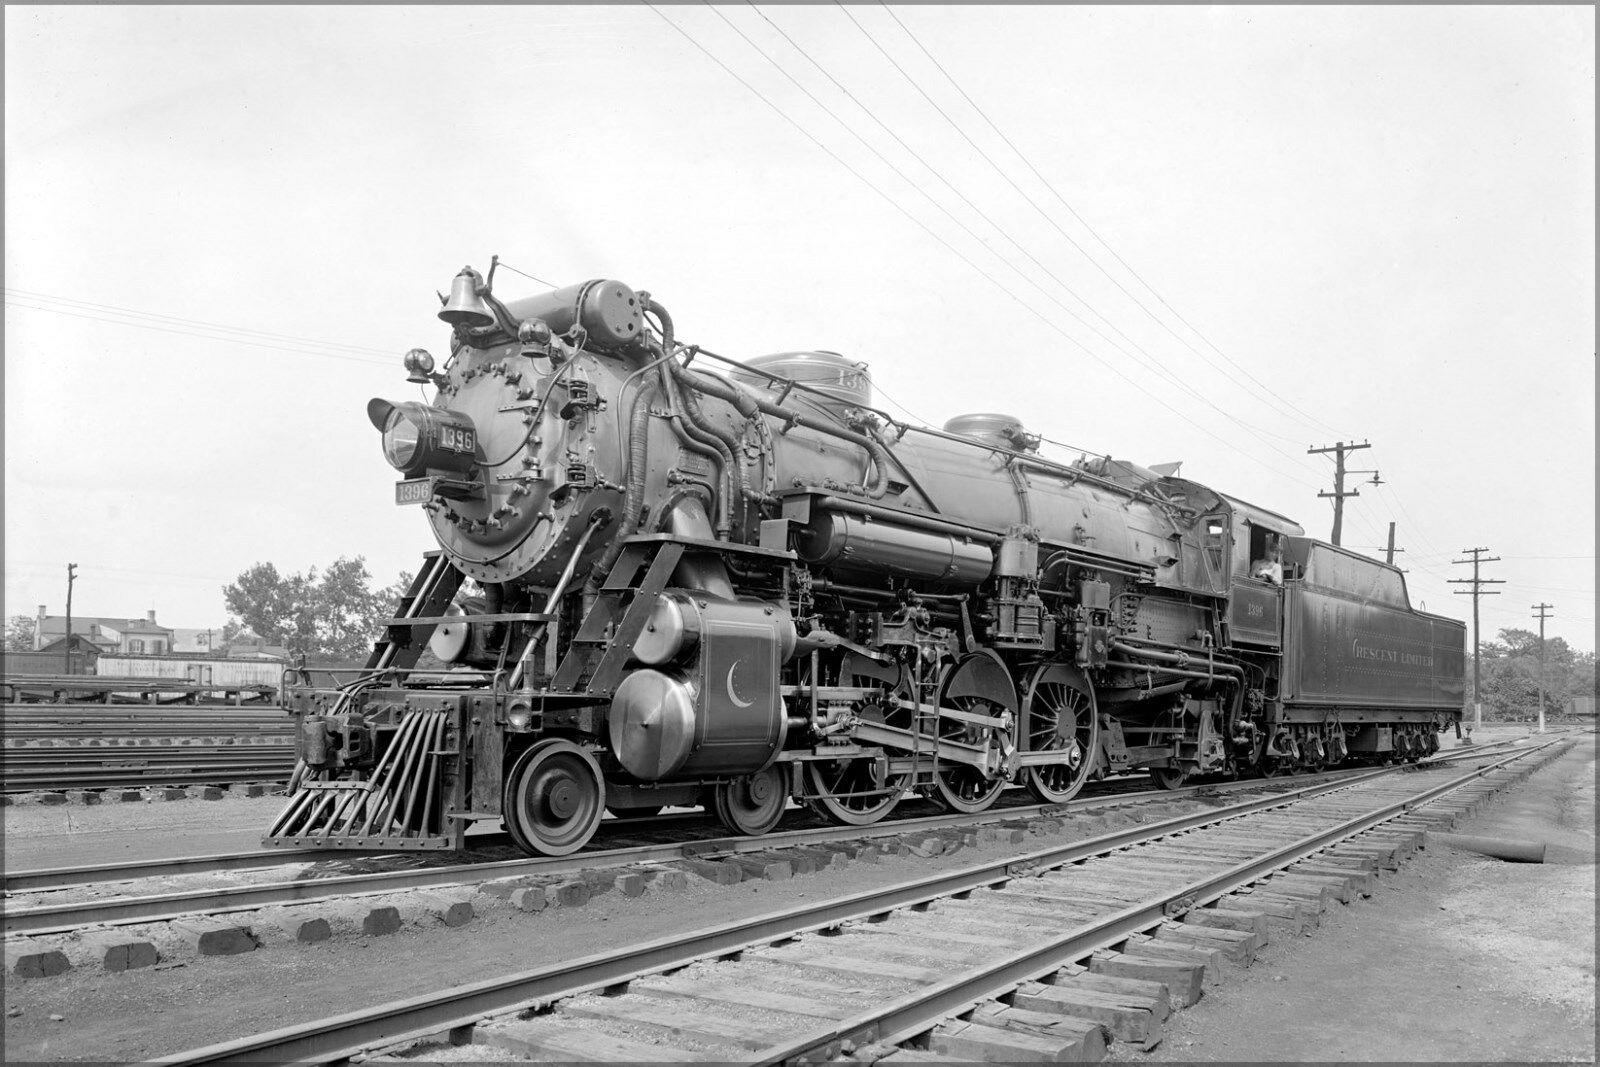 Plakat, Viele Größen; Süd Eisenbahn Company Mondsichel Lokomotive 1926